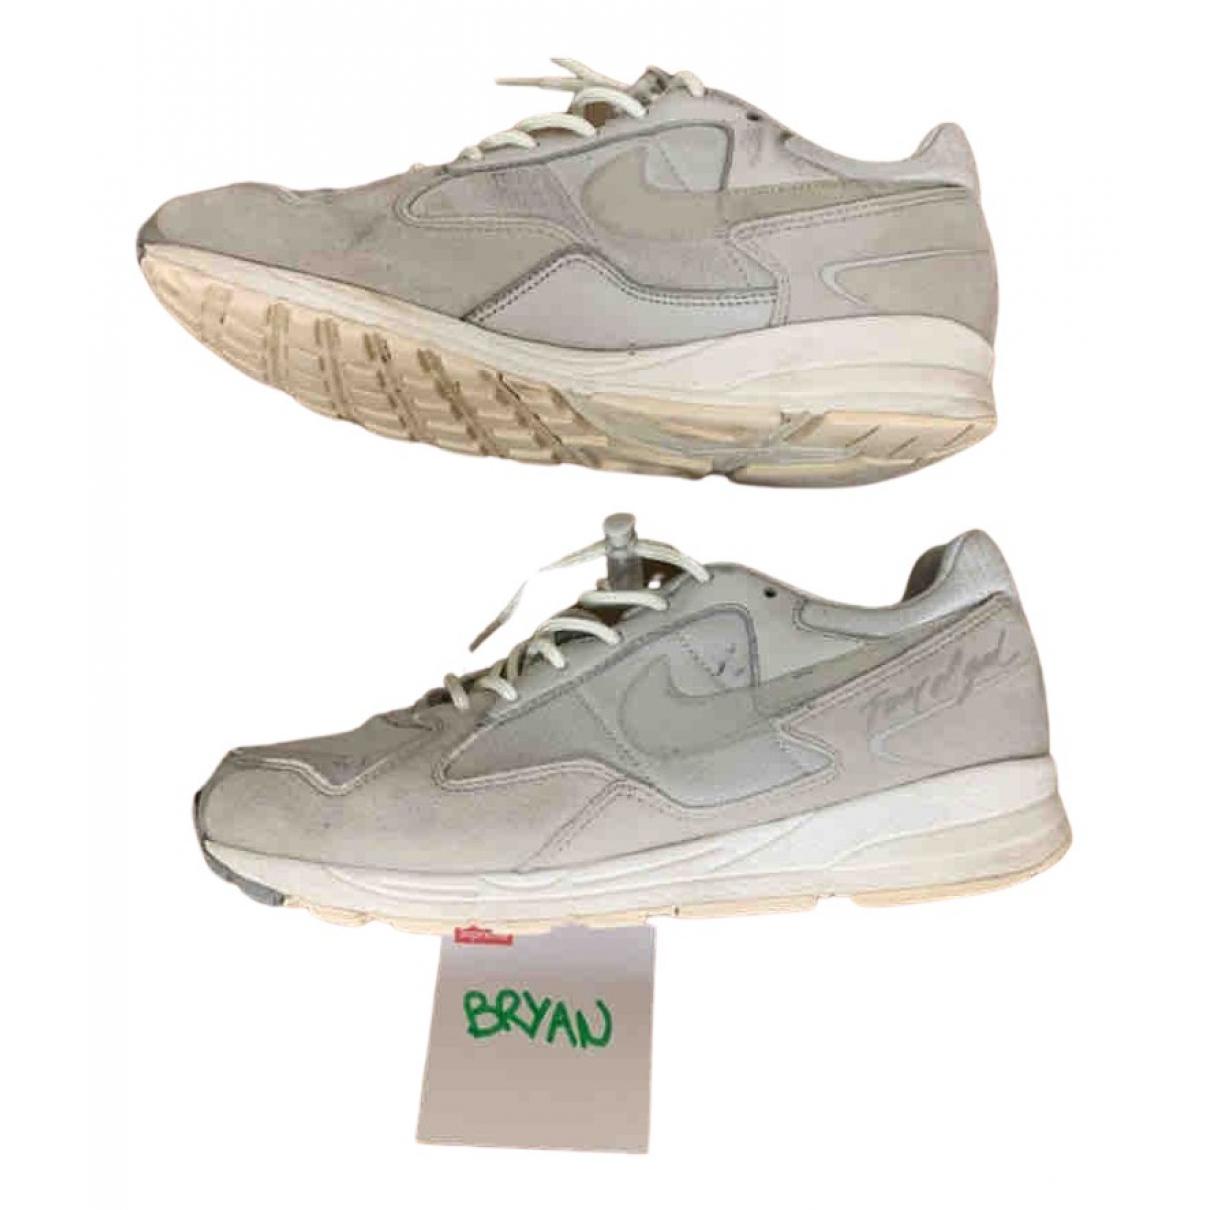 Nike X Fear Of God Air Skylon 2 Sneakers in  Beige Lackleder